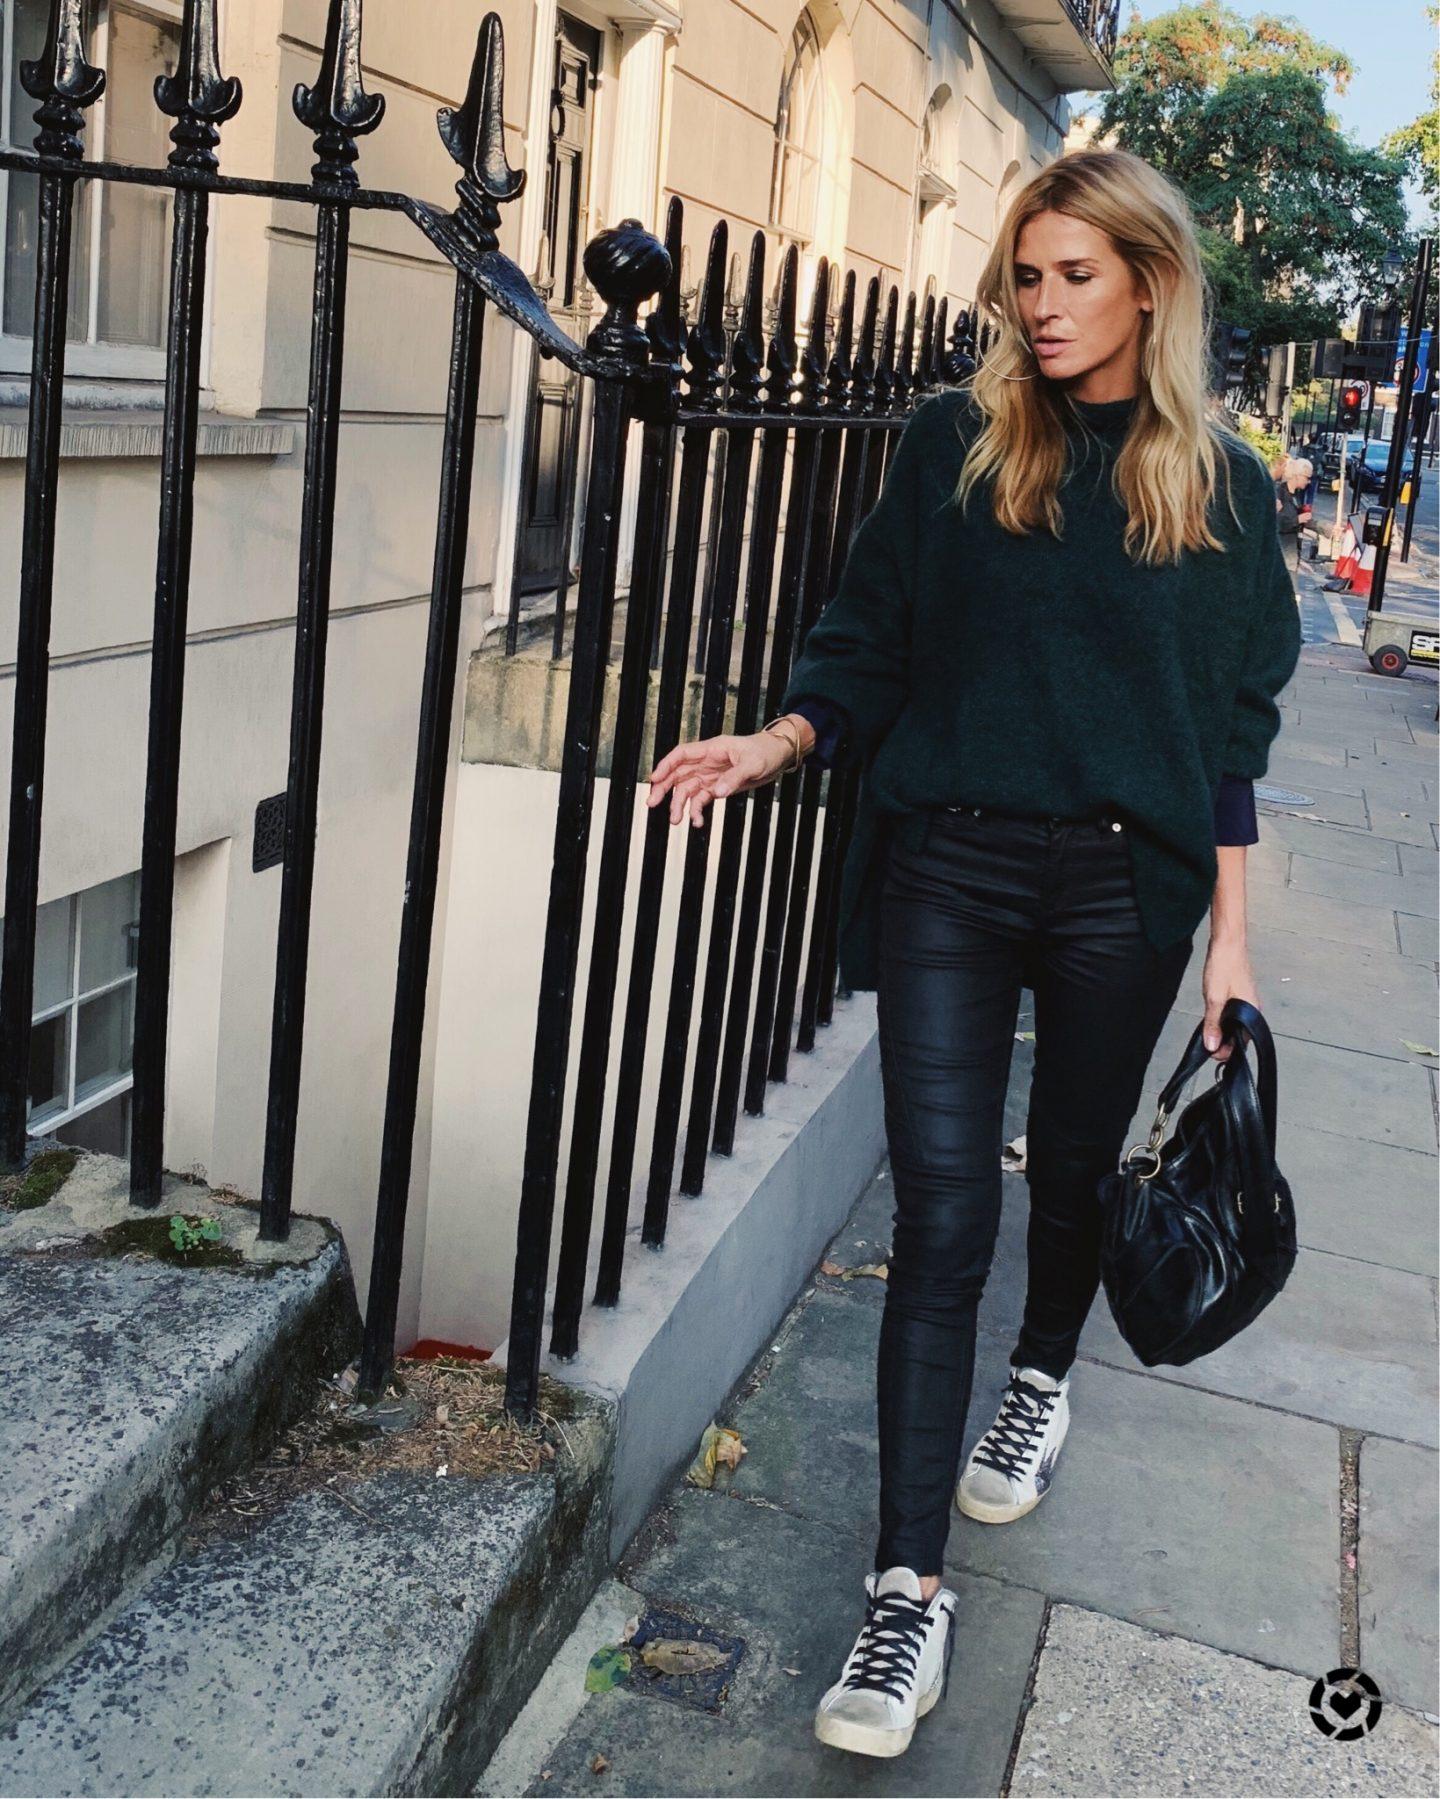 knitwear haul fashion and style edit